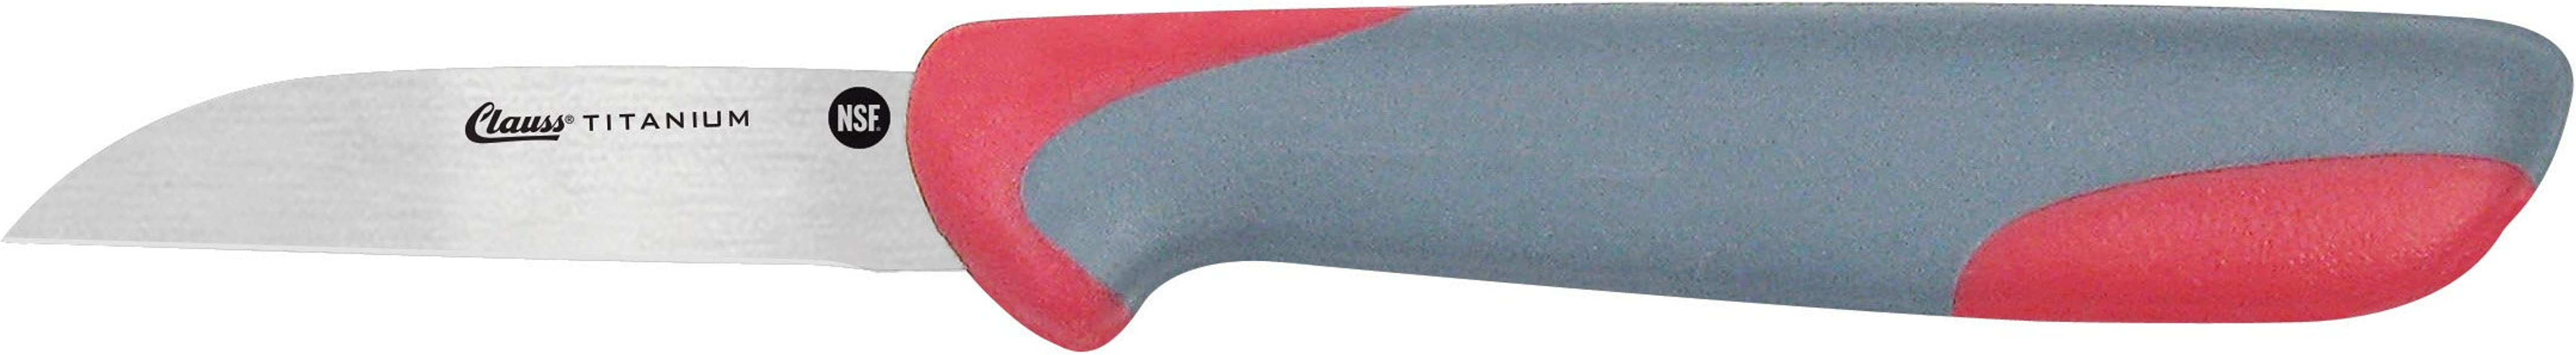 Clauss Titanium Bonded Straight Paring Knife 2 5 18428